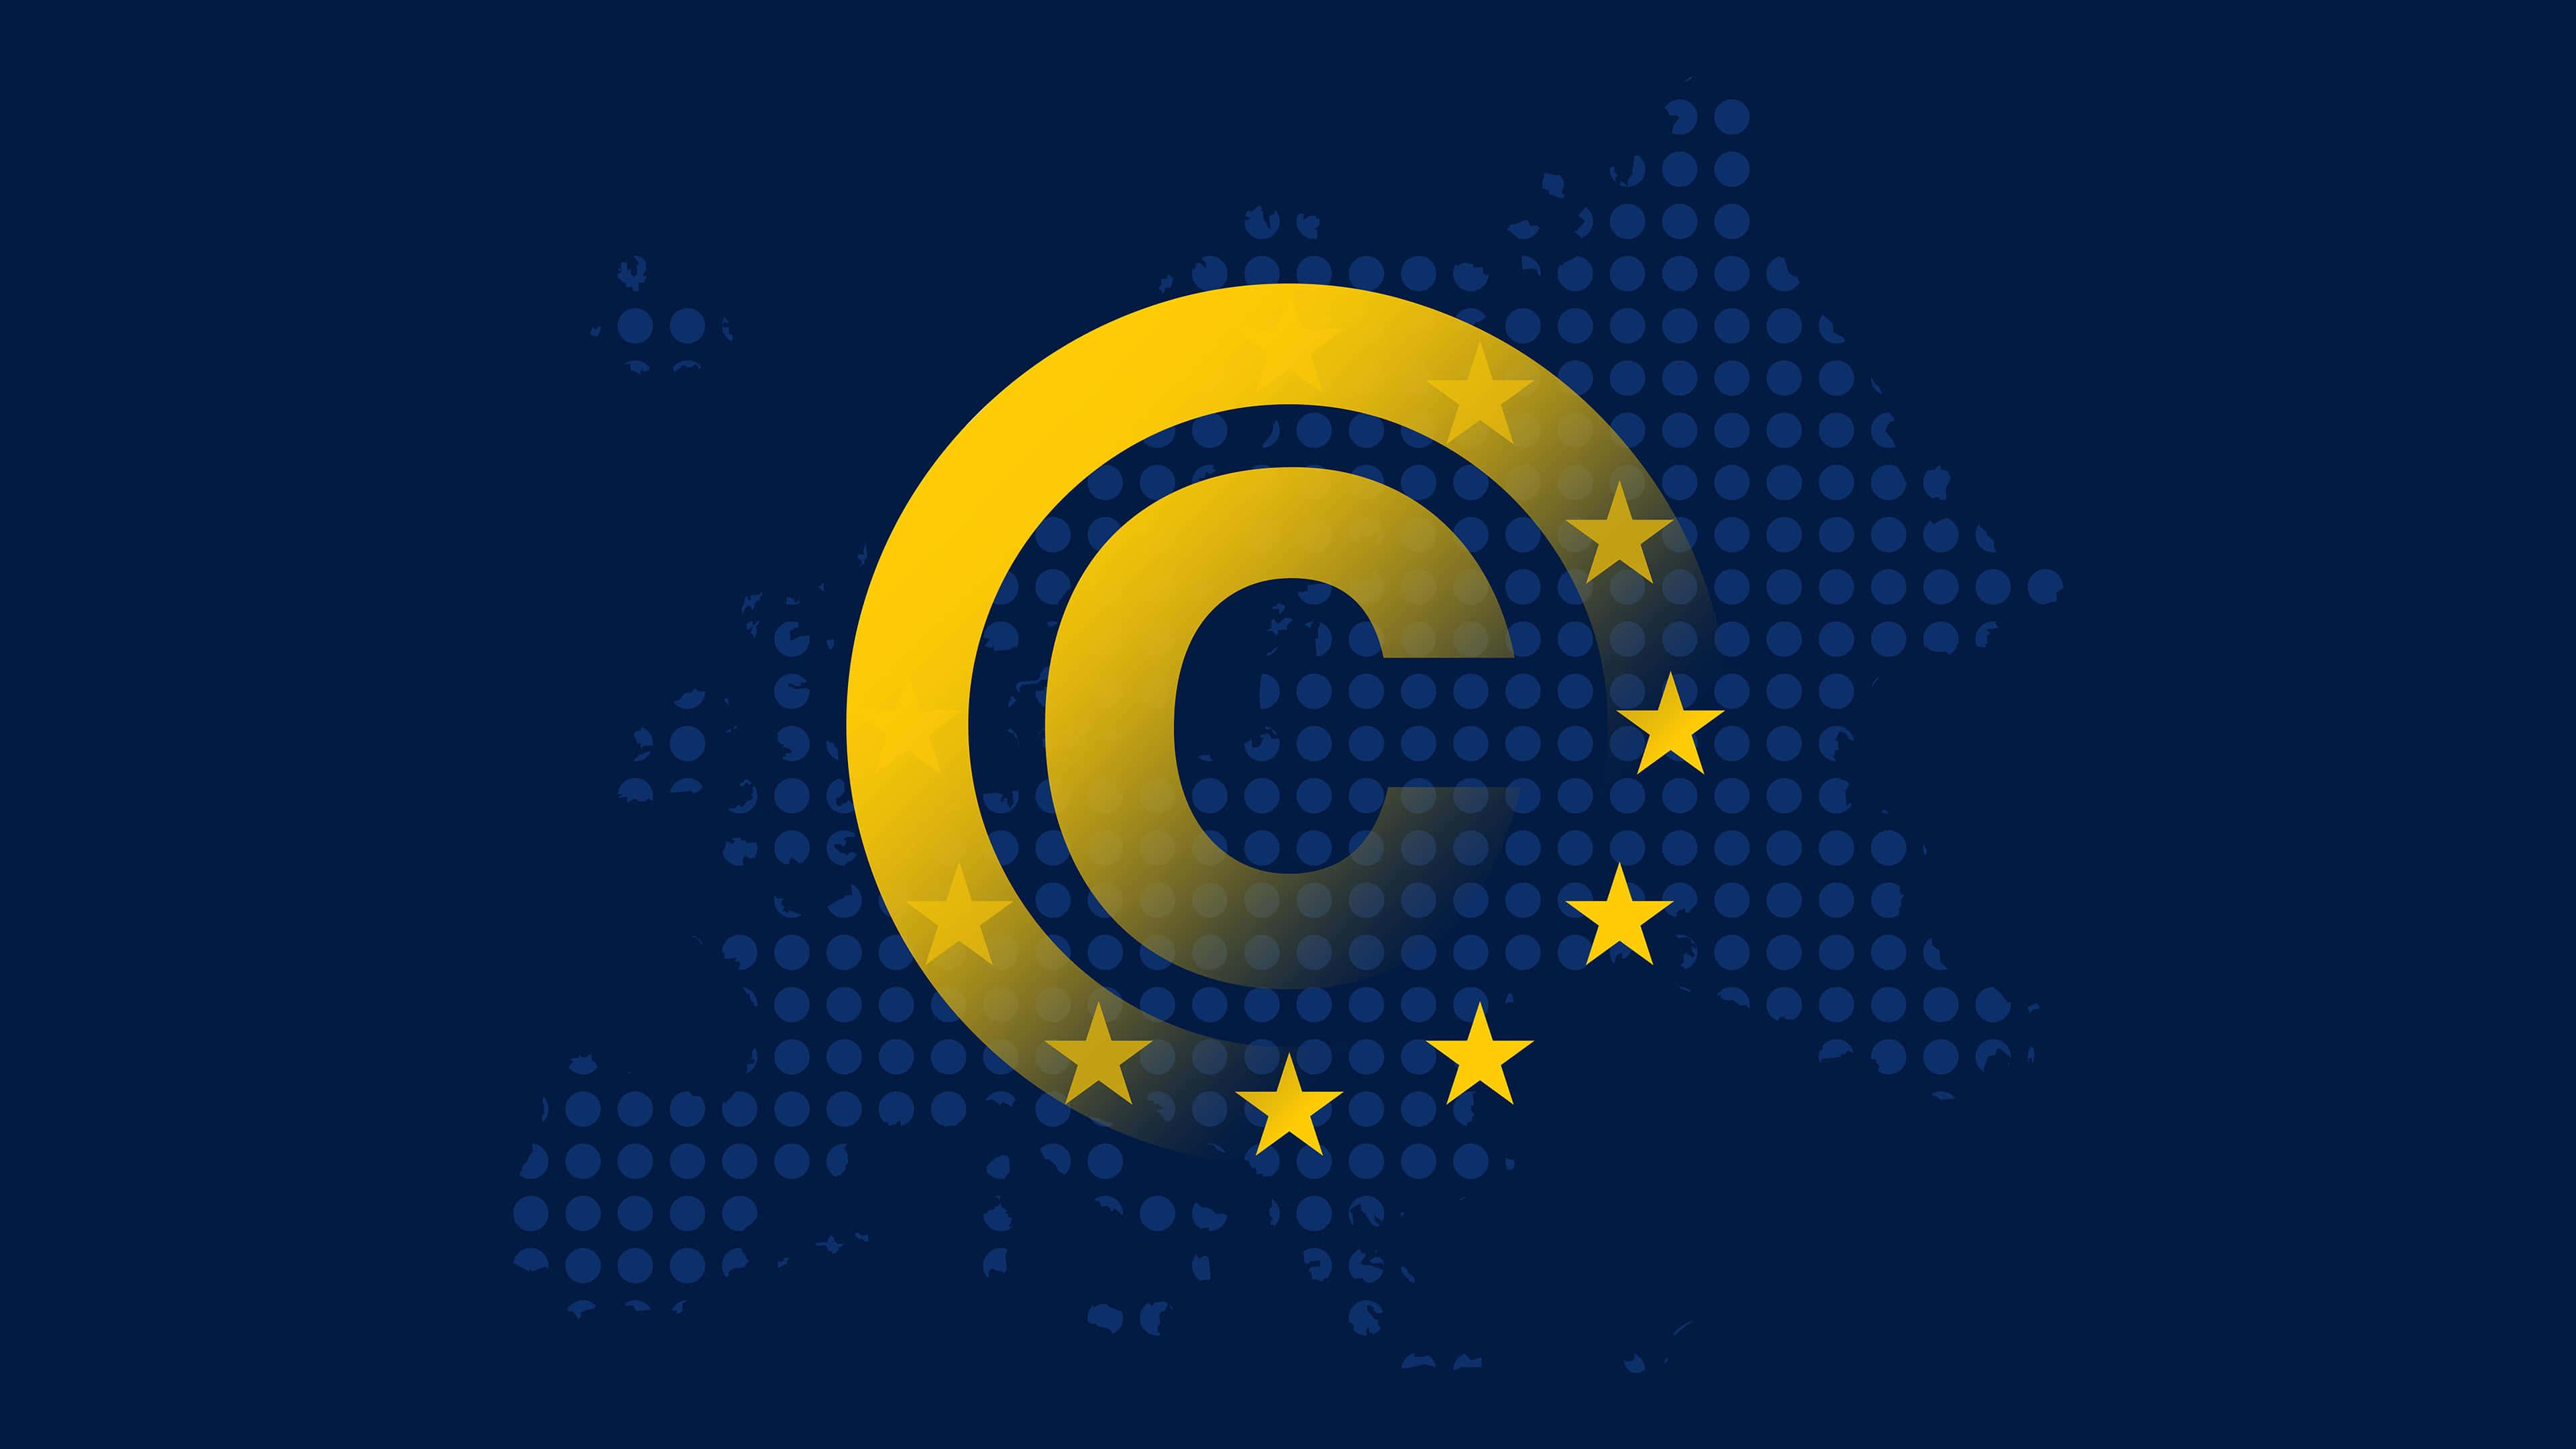 european union article 13 copyright directive uhd 4k wallpaper